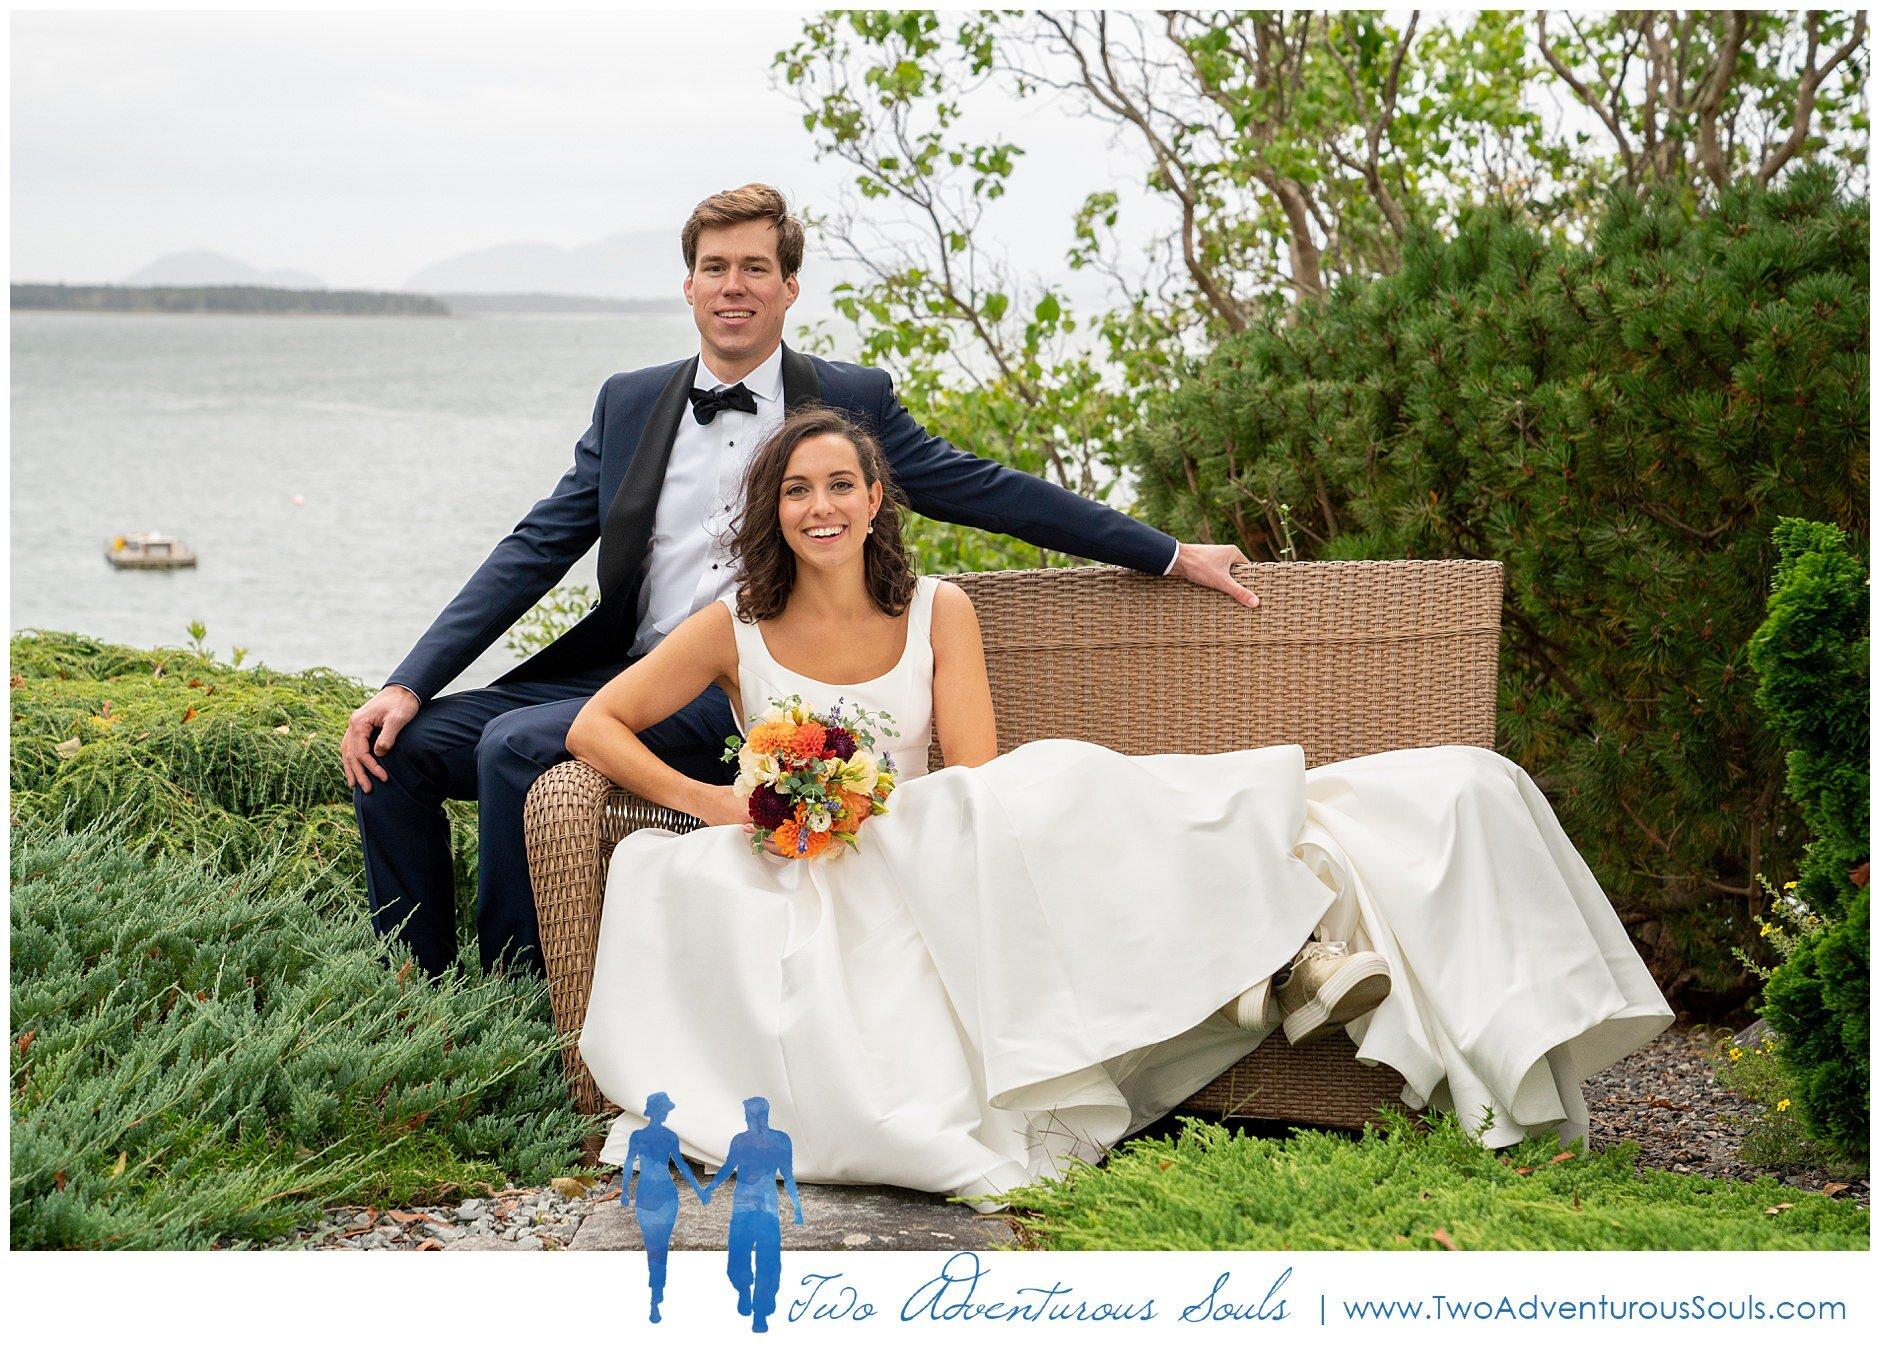 Bar Harbor Wedding Photographers, Acadia Bay Inn Wedding Photographers, Two Adventurous Souls- 091419_0030.jpg